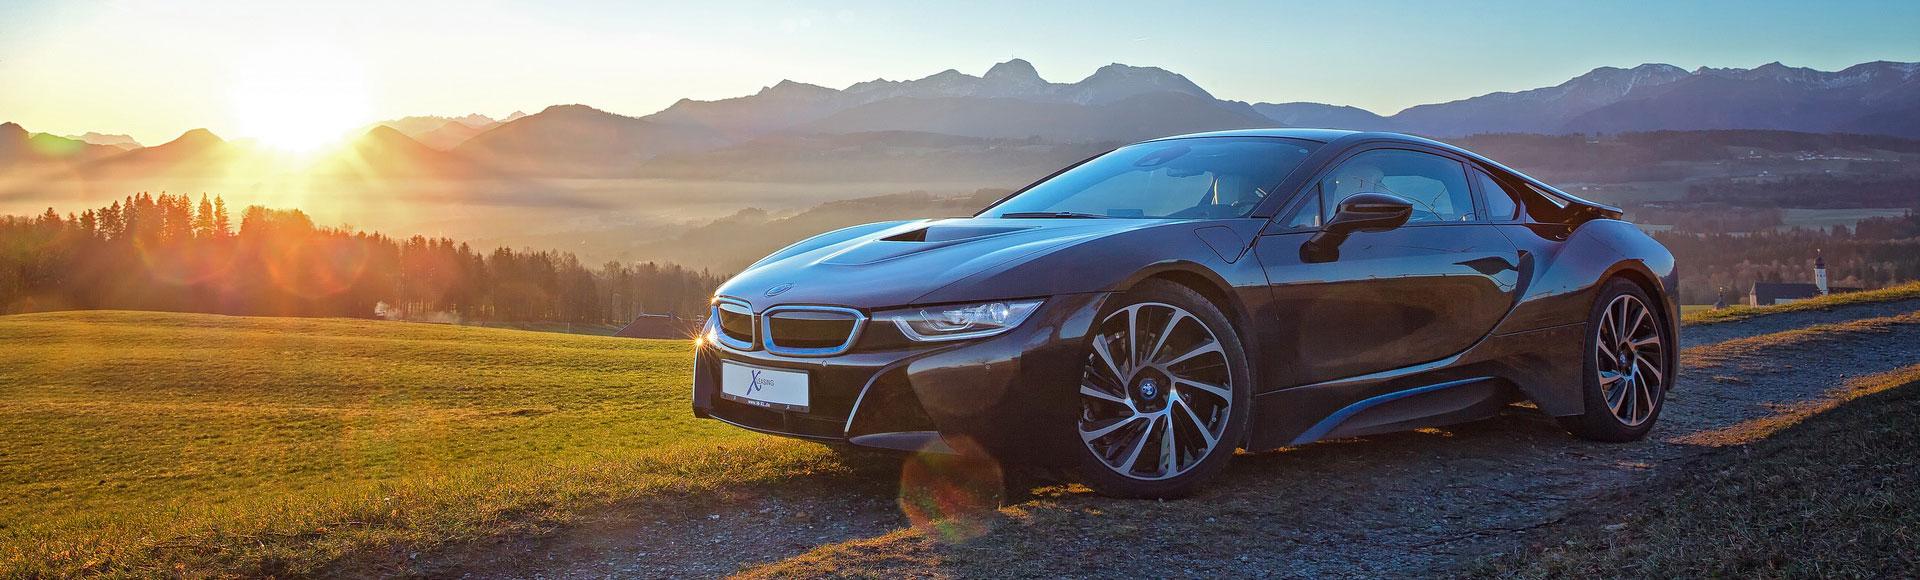 BMW i8 2015 Herbst 1281